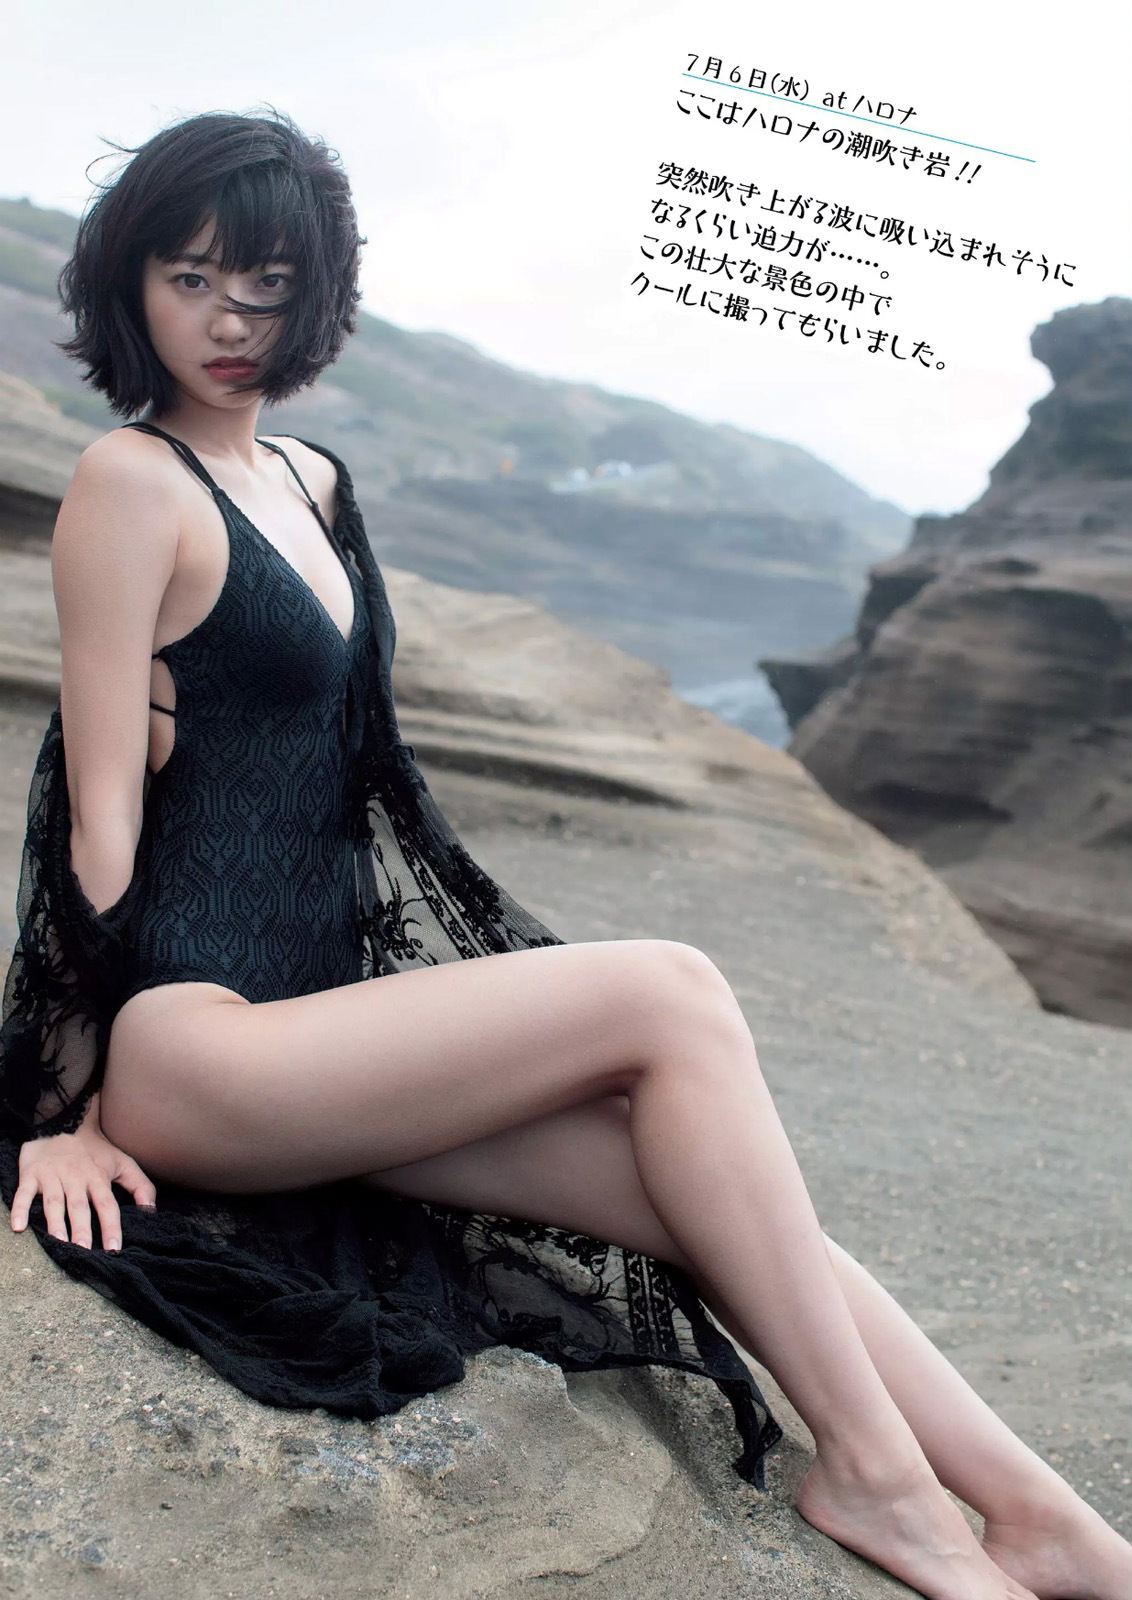 eyval.net: 武田玲奈. たけだ れな. Rena Takeda - Weekly Playboy / 2016.09.19